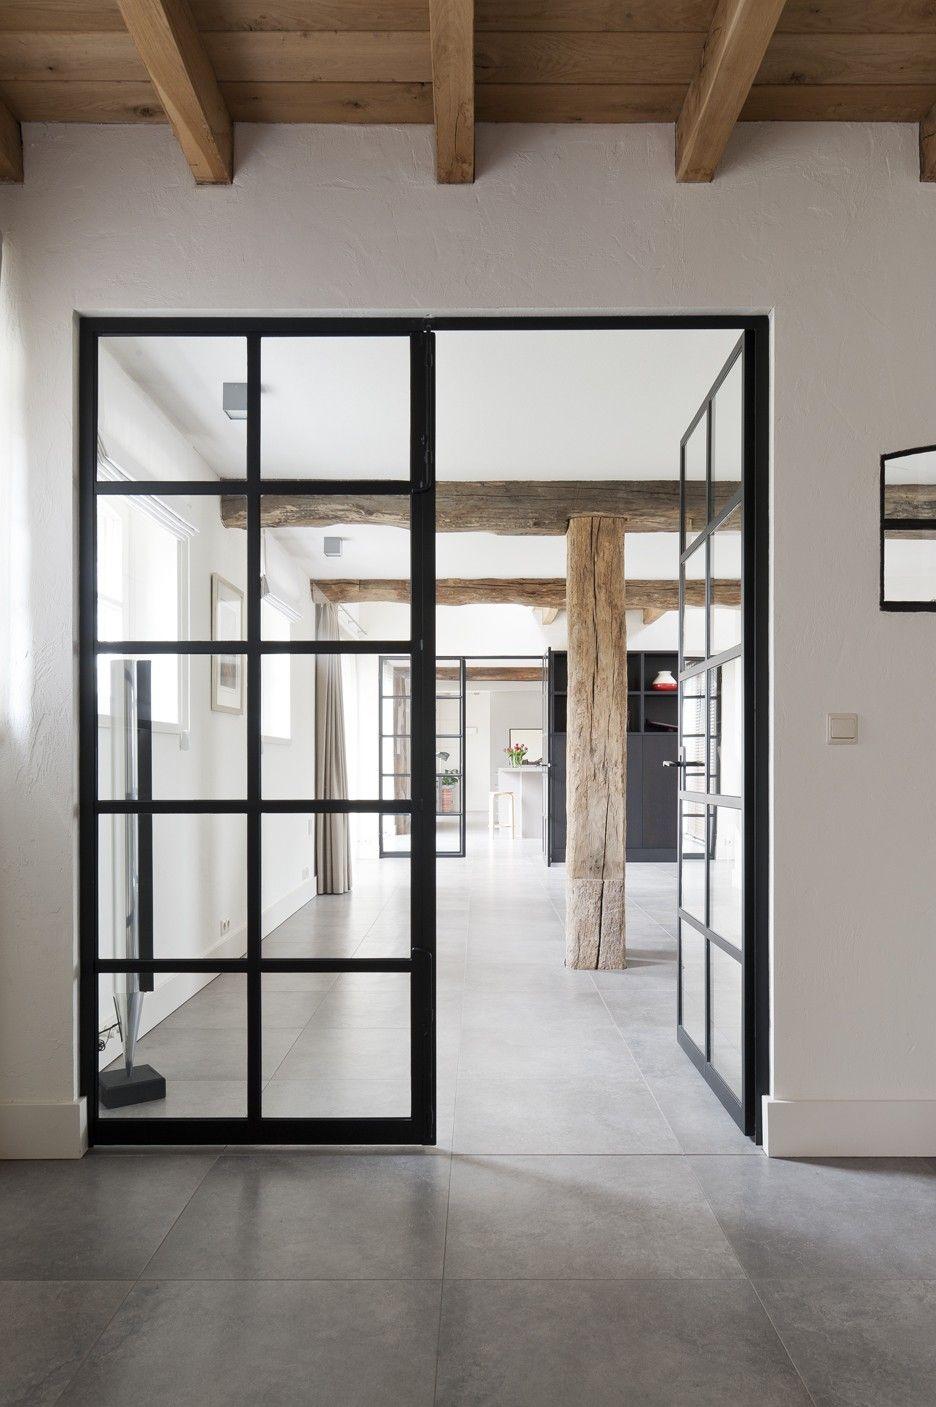 Fliesen im beton look gradlienig verlegt kombination aus for Puertas acristaladas interior